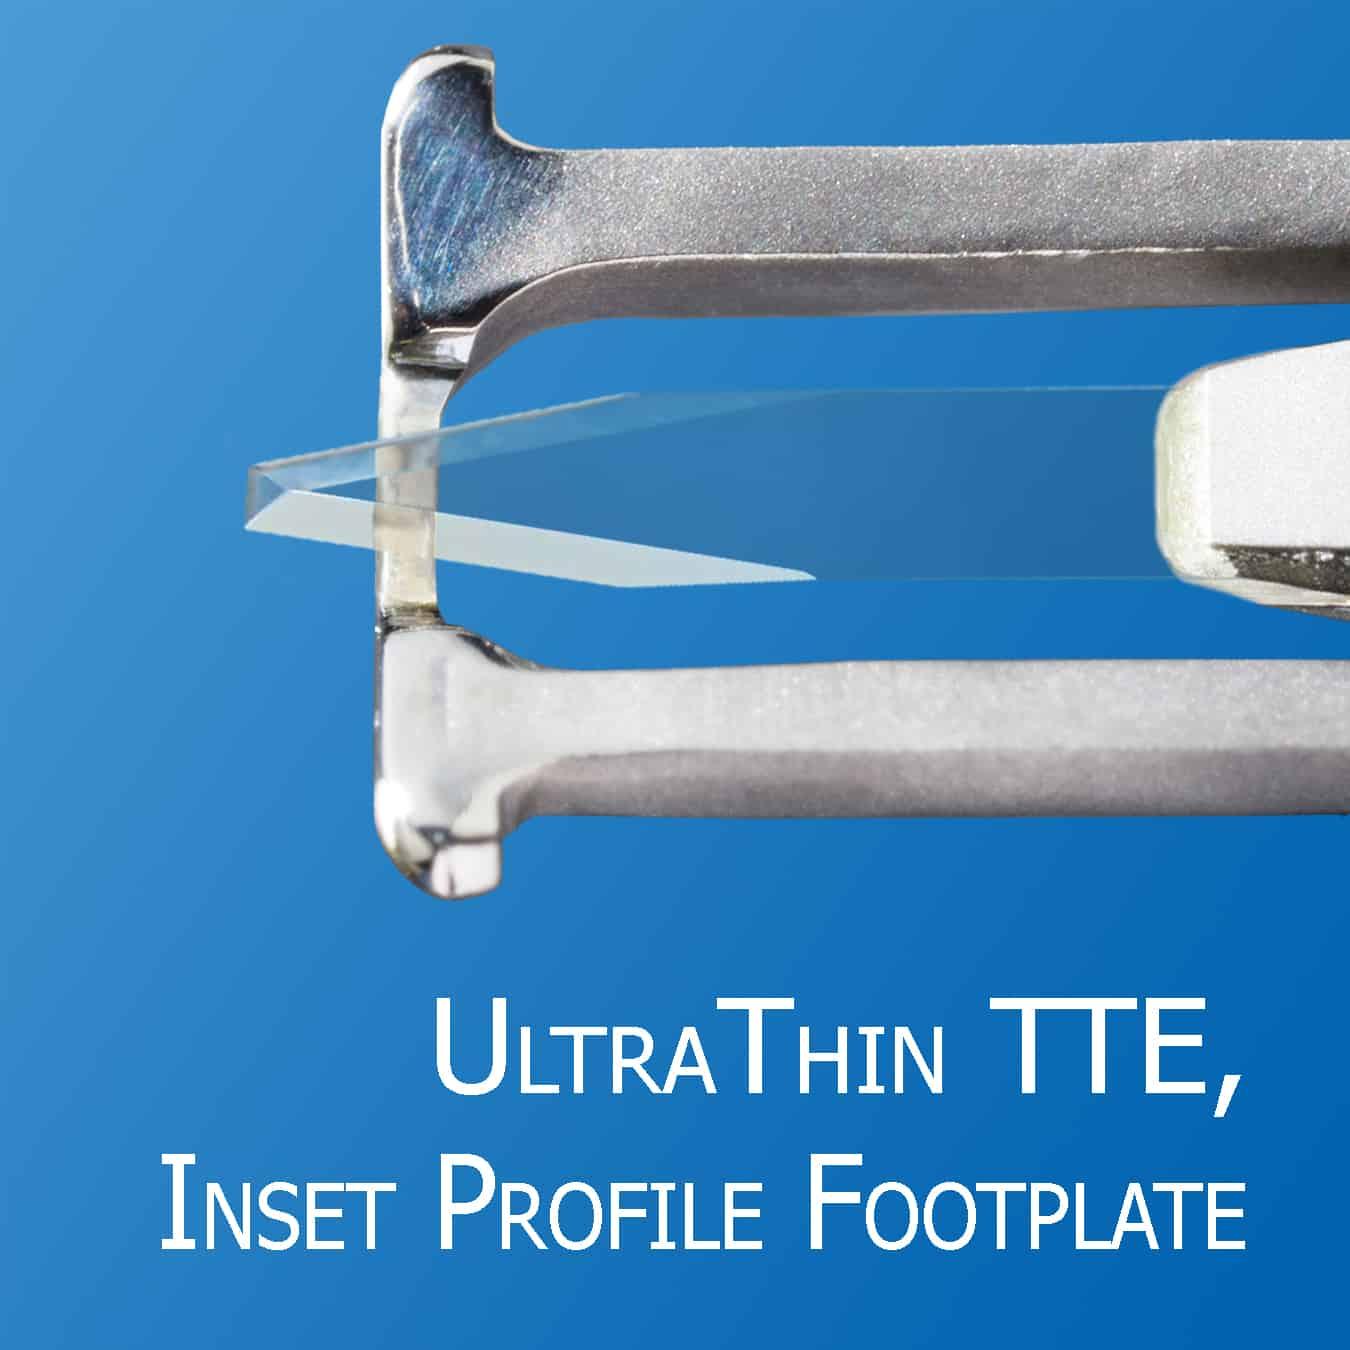 UltraThin Truncated Triple Edge, Elite II Micrometer